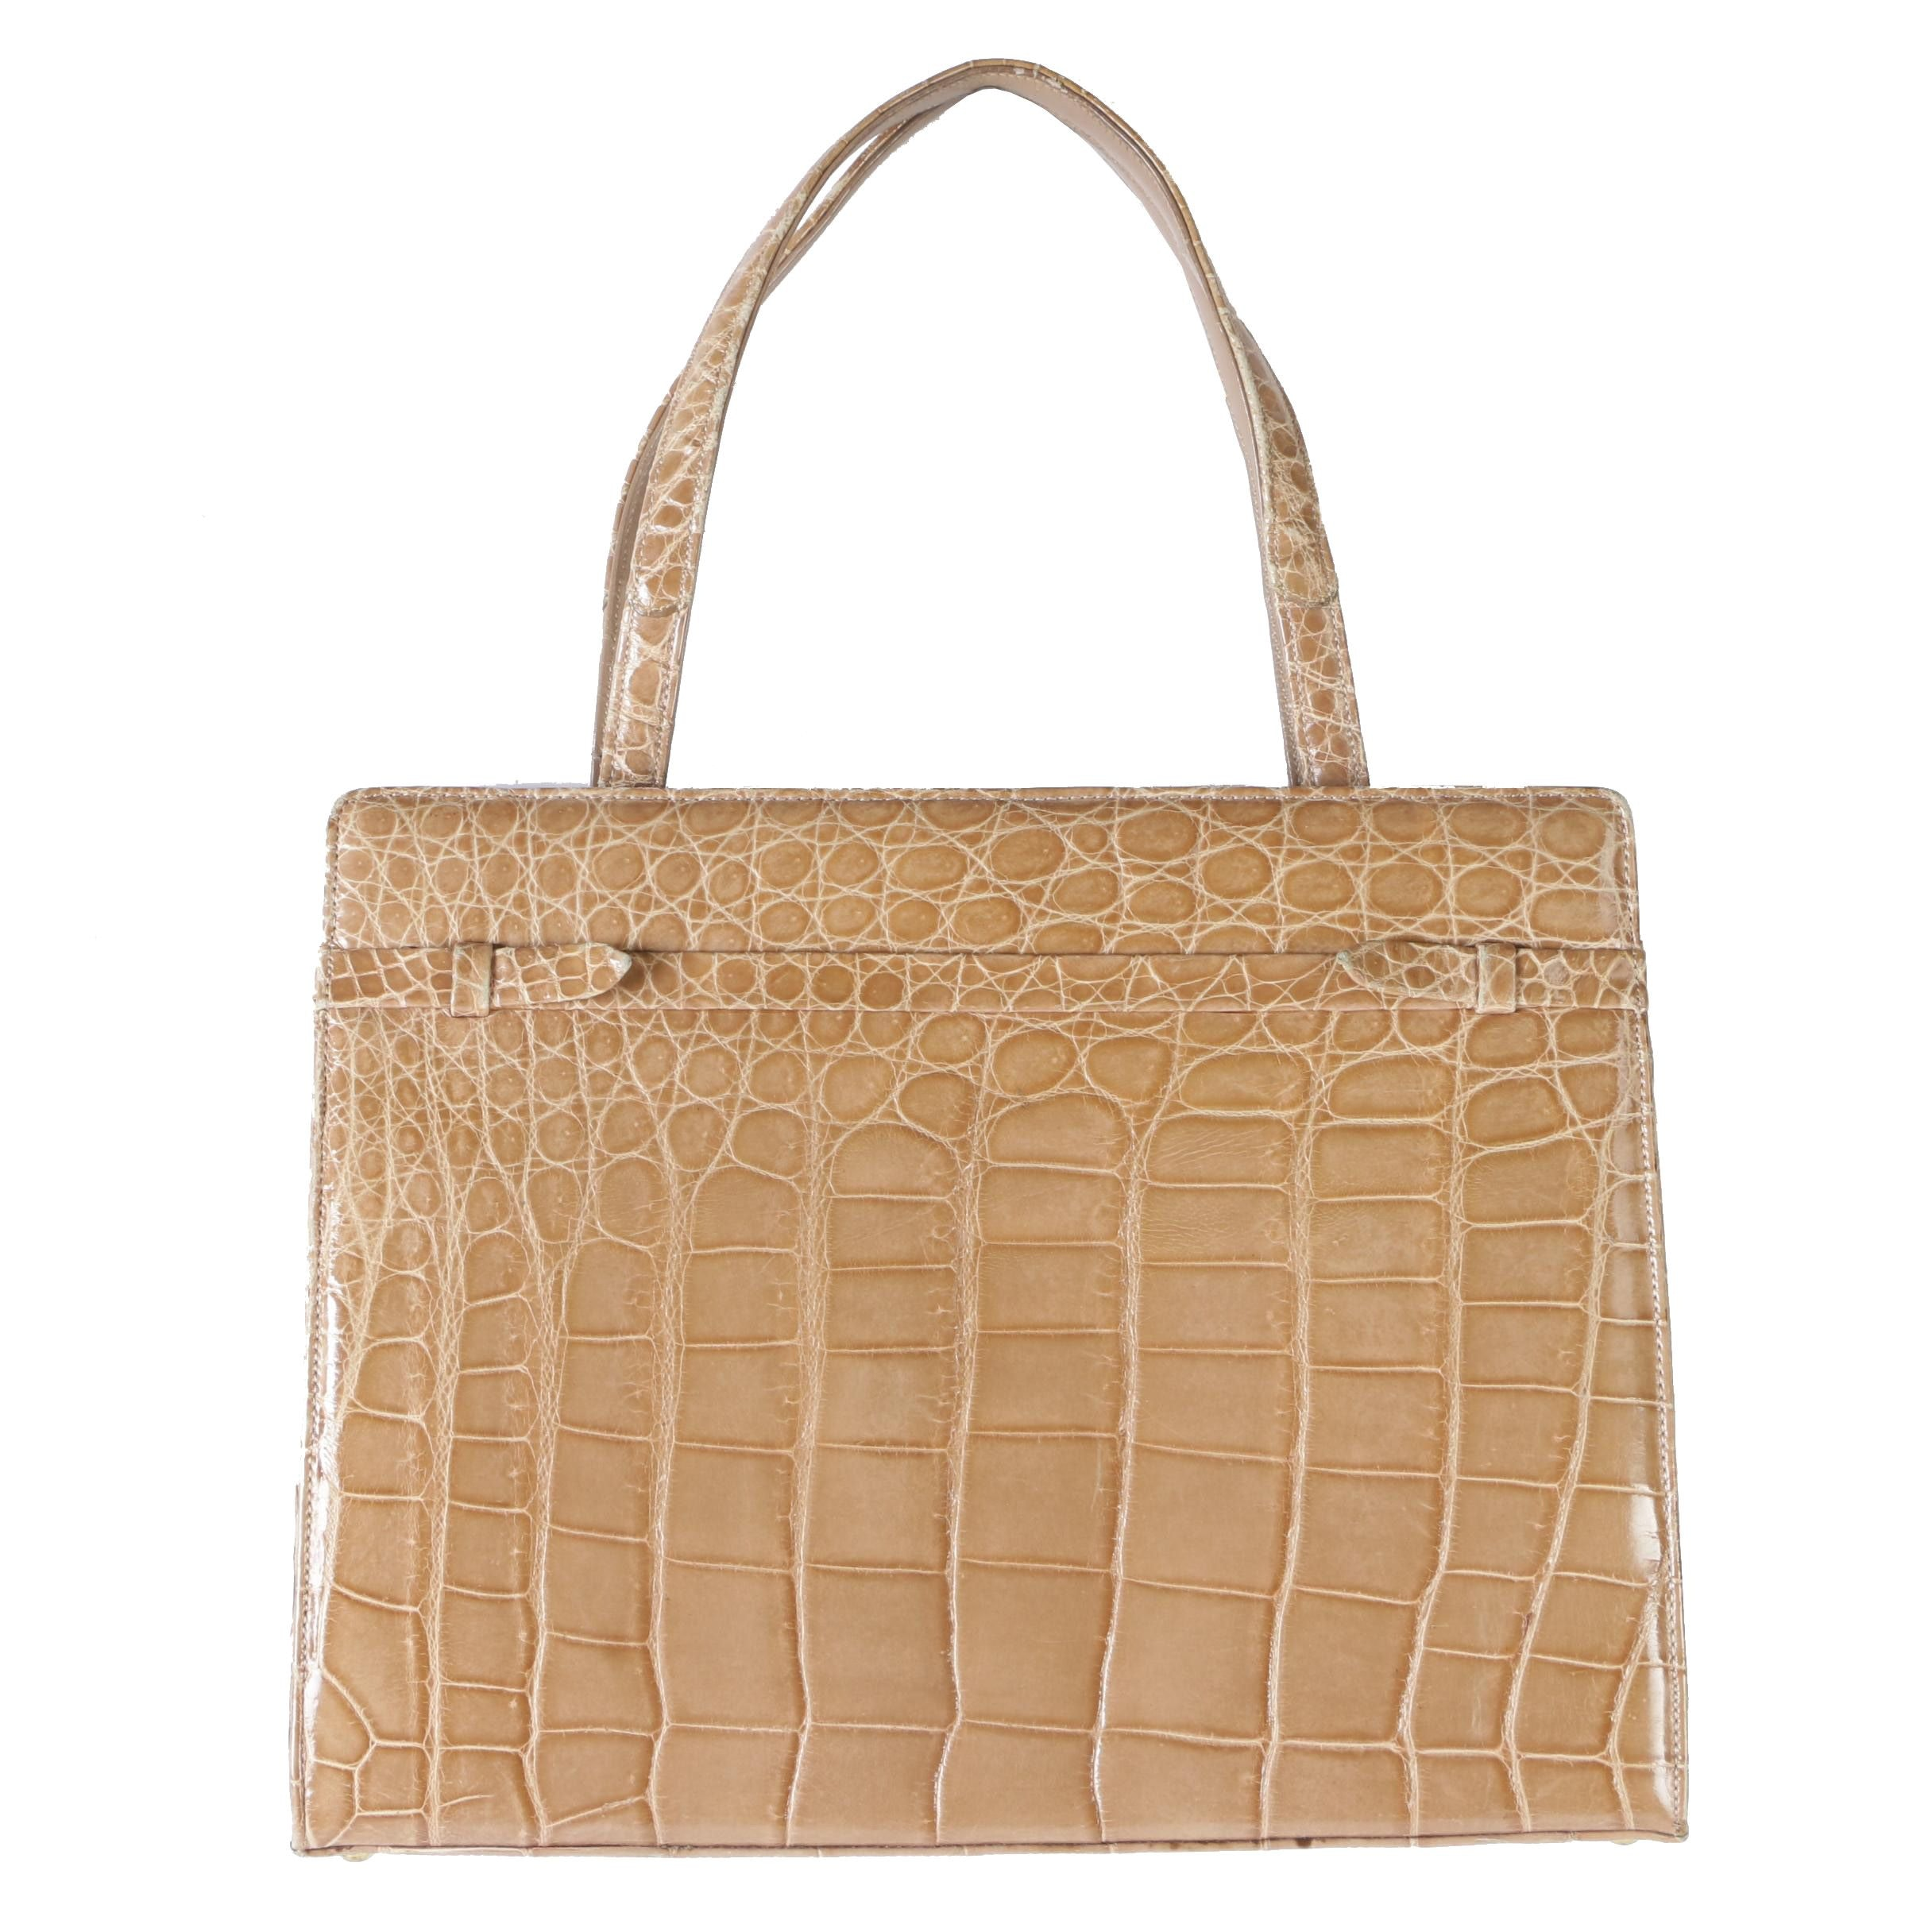 Manon for Saks Fifth Avenue Tan Alligator Skin Kelly Style Handbag,1960s Vintage